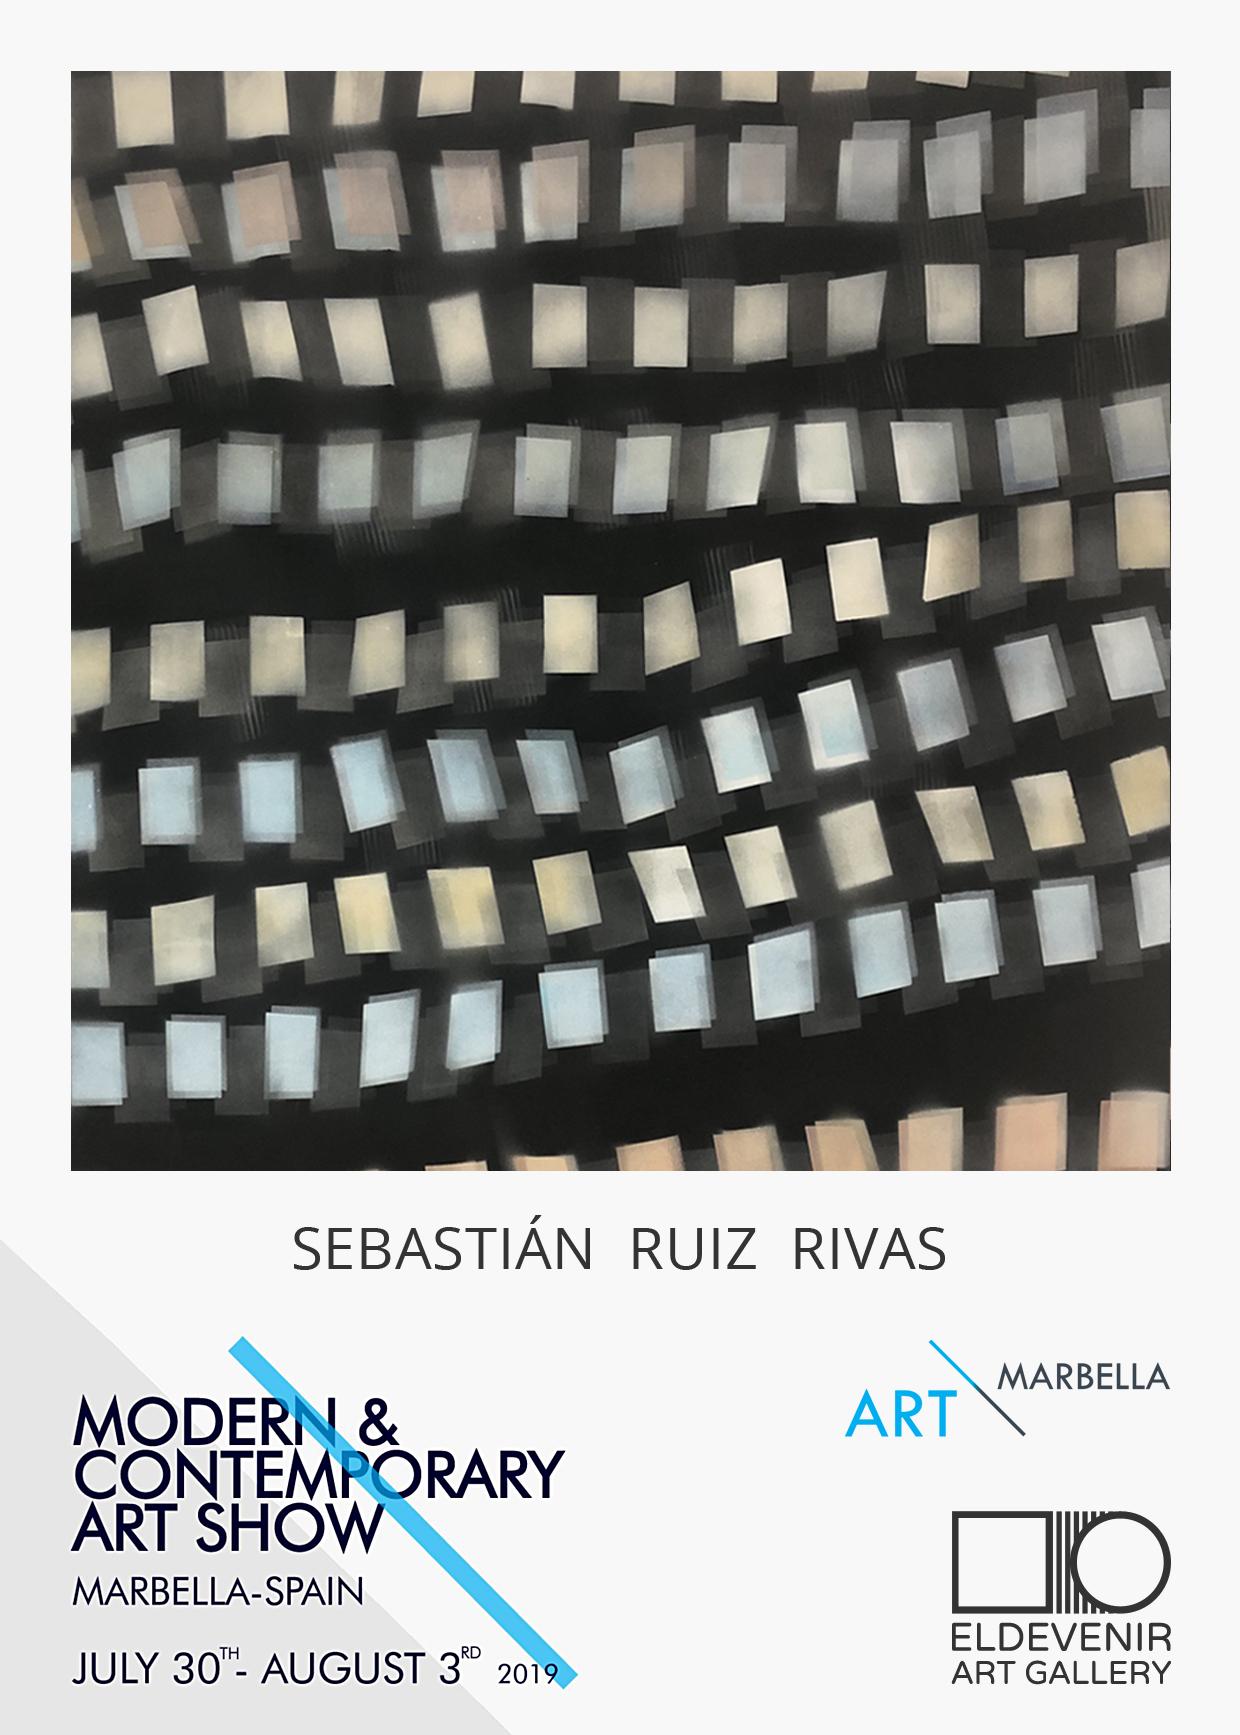 Postal-artmarbella2019-sebastian-ruiz-rivas-eldevenir-art-gallery-malaga-galeria-arte-contemporaneo-coleccionismo-nerja-axarquia-torrox-maria-rosa-jurado.jpg